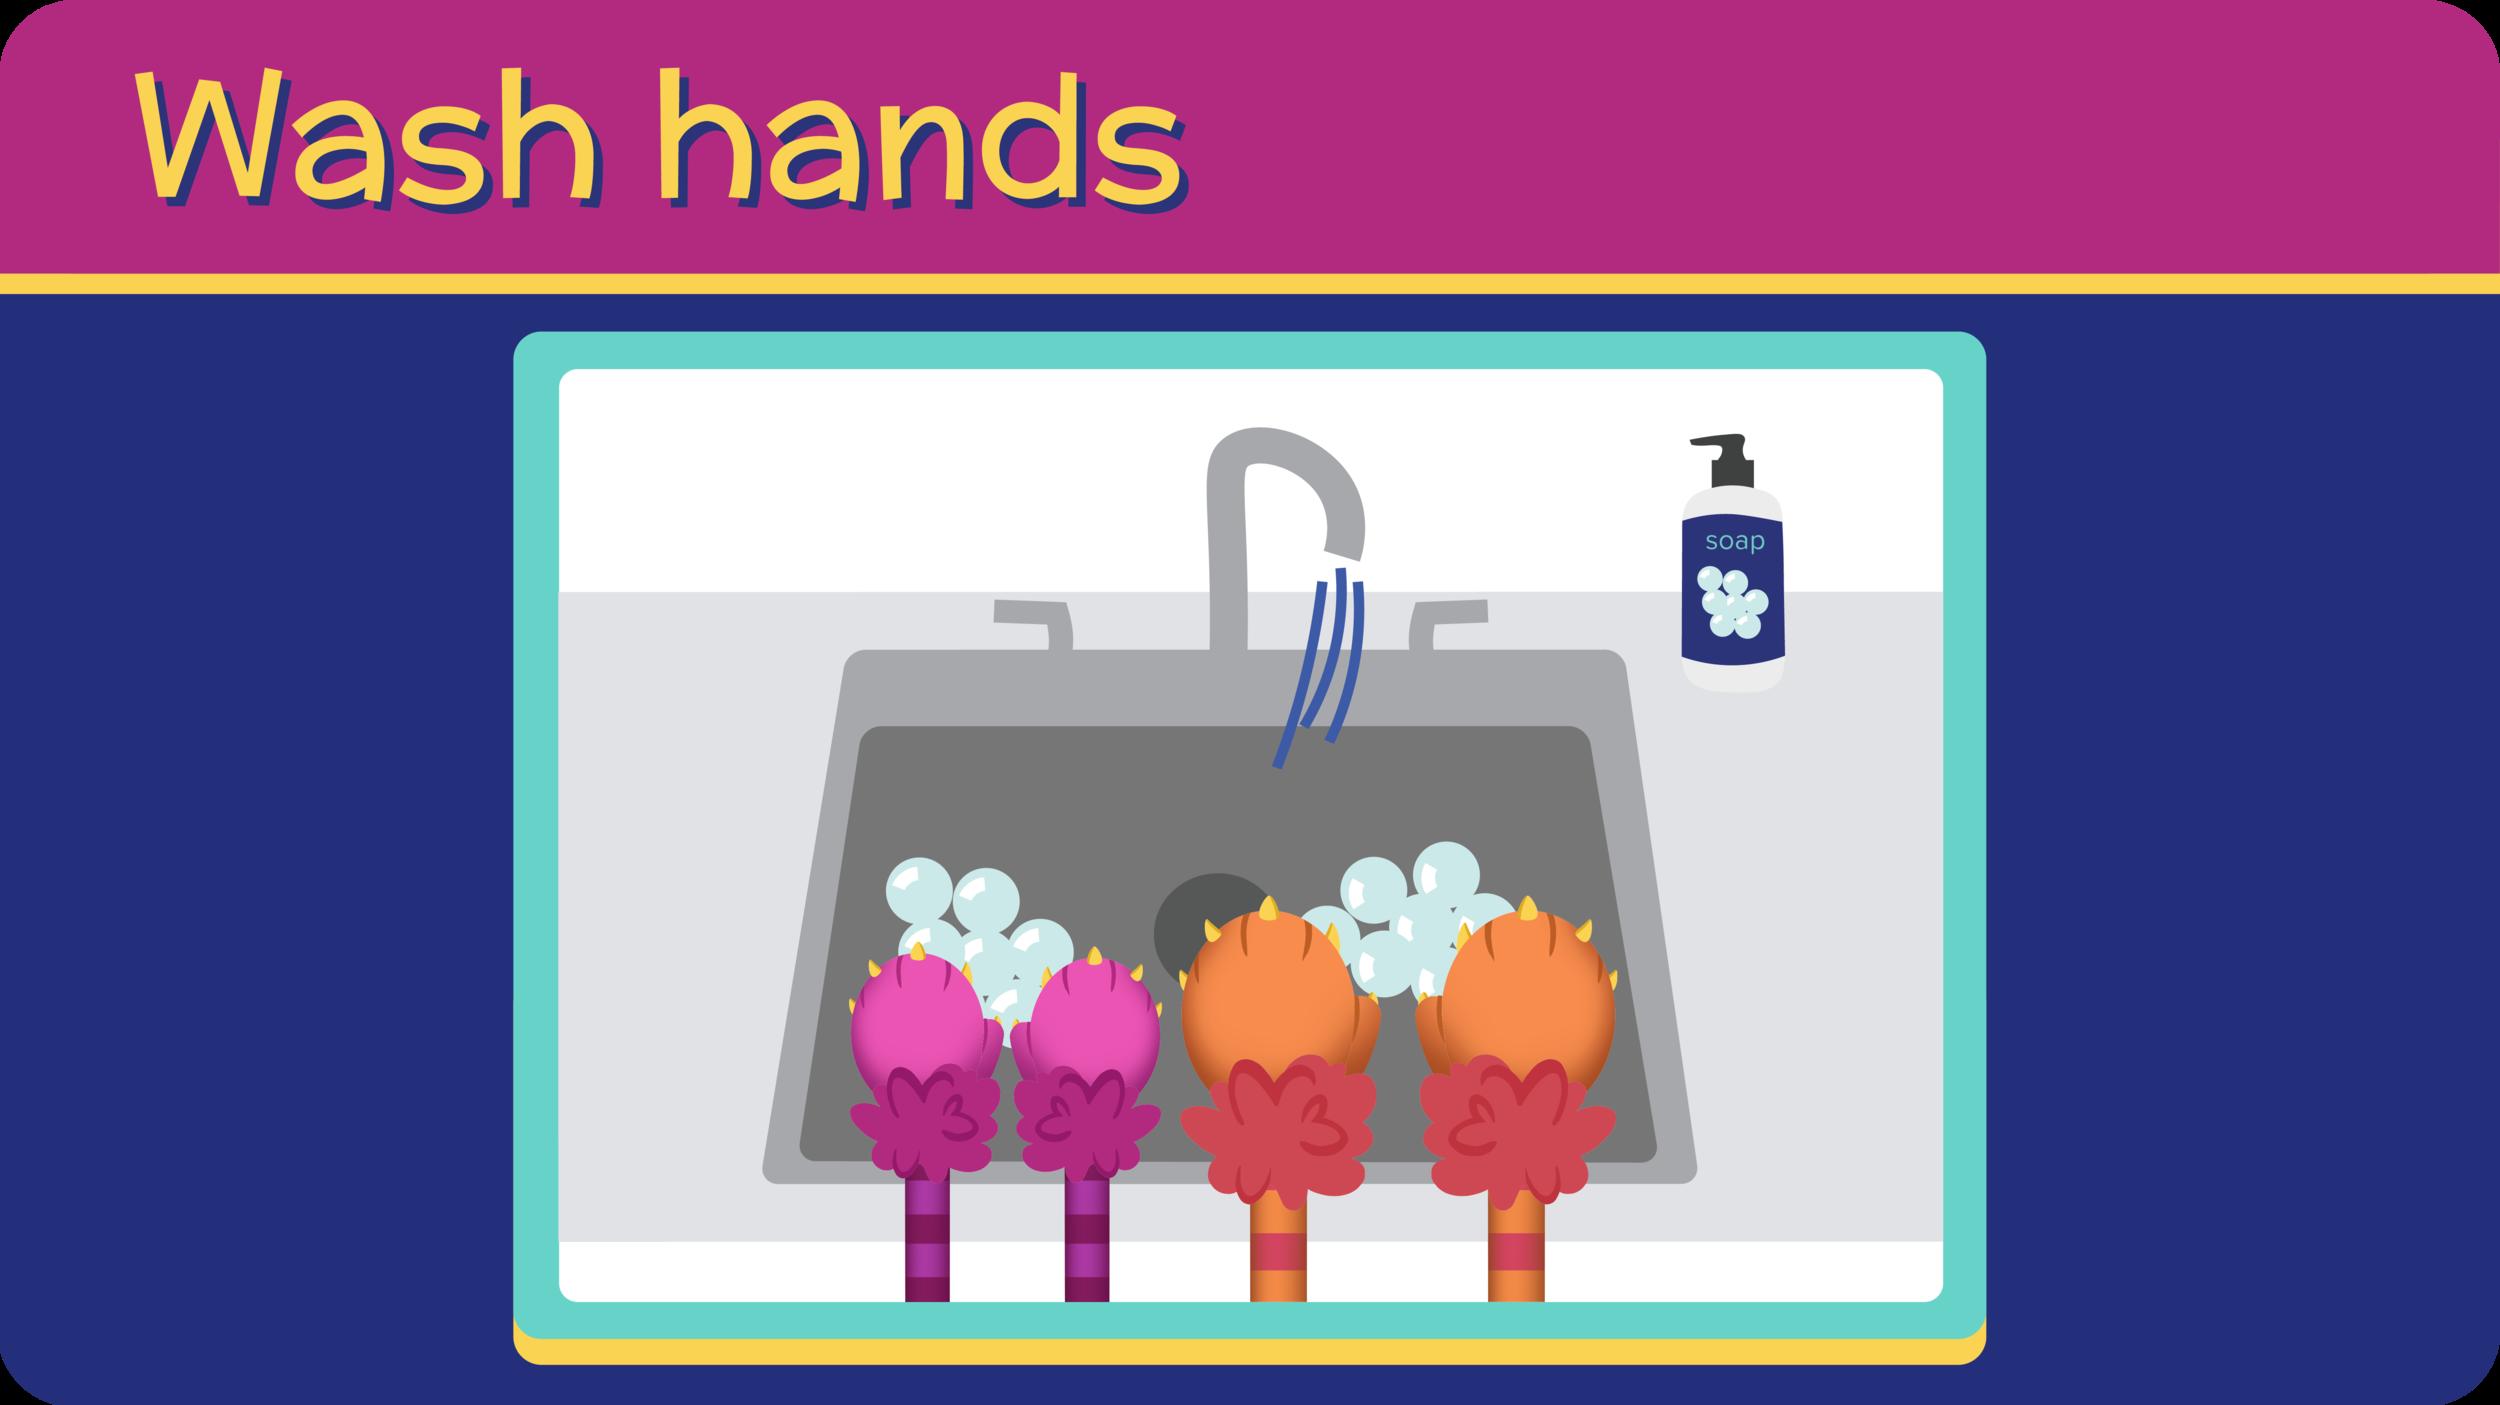 03_TeriyakiChickenBroccoli_Wash Hands.png